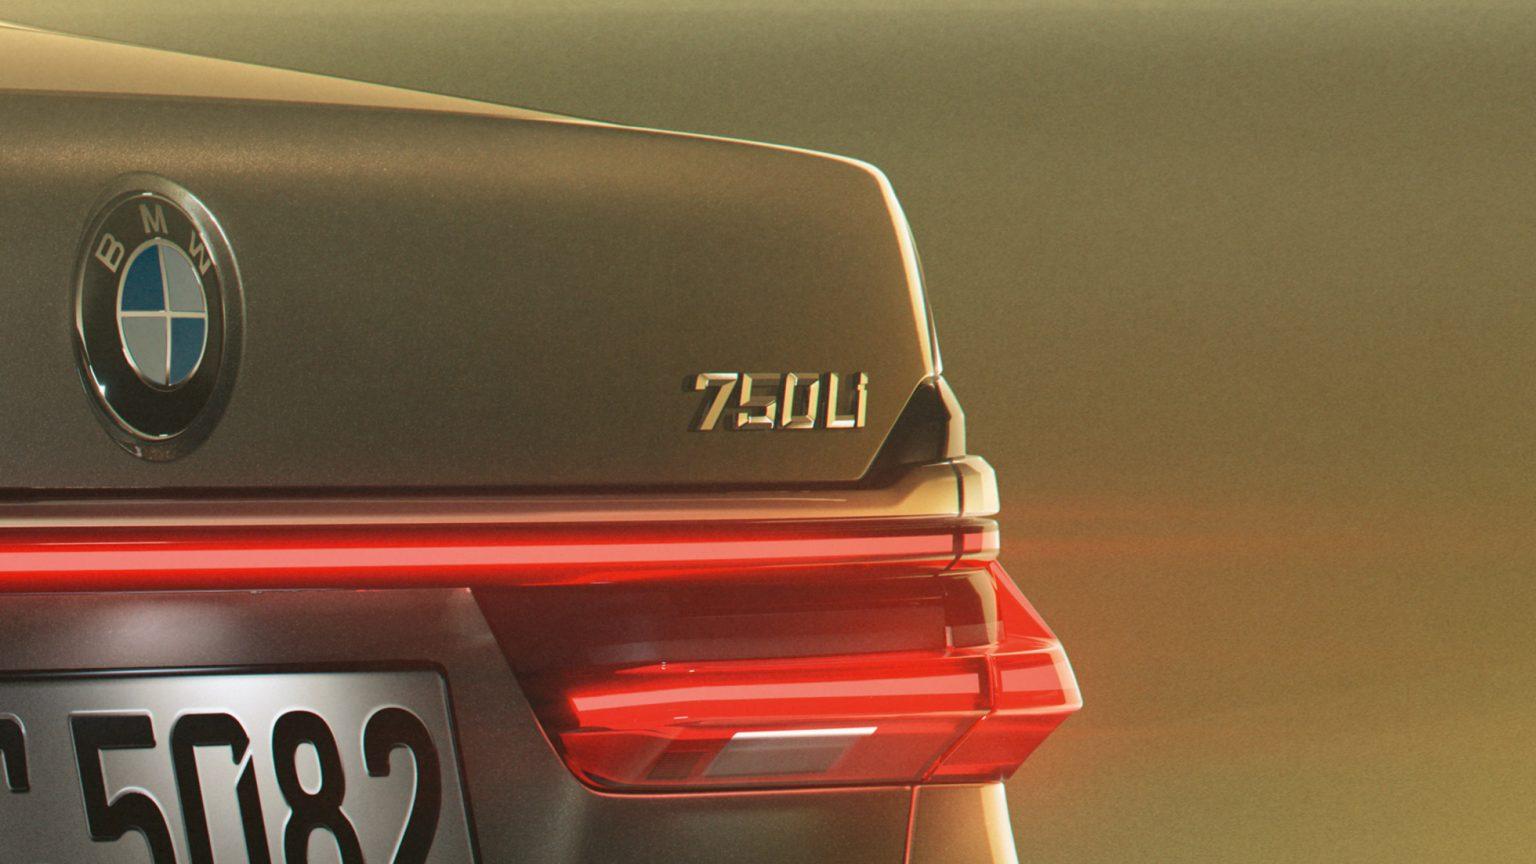 bmw-7series-sedan-inspire-highlight-03-desktop